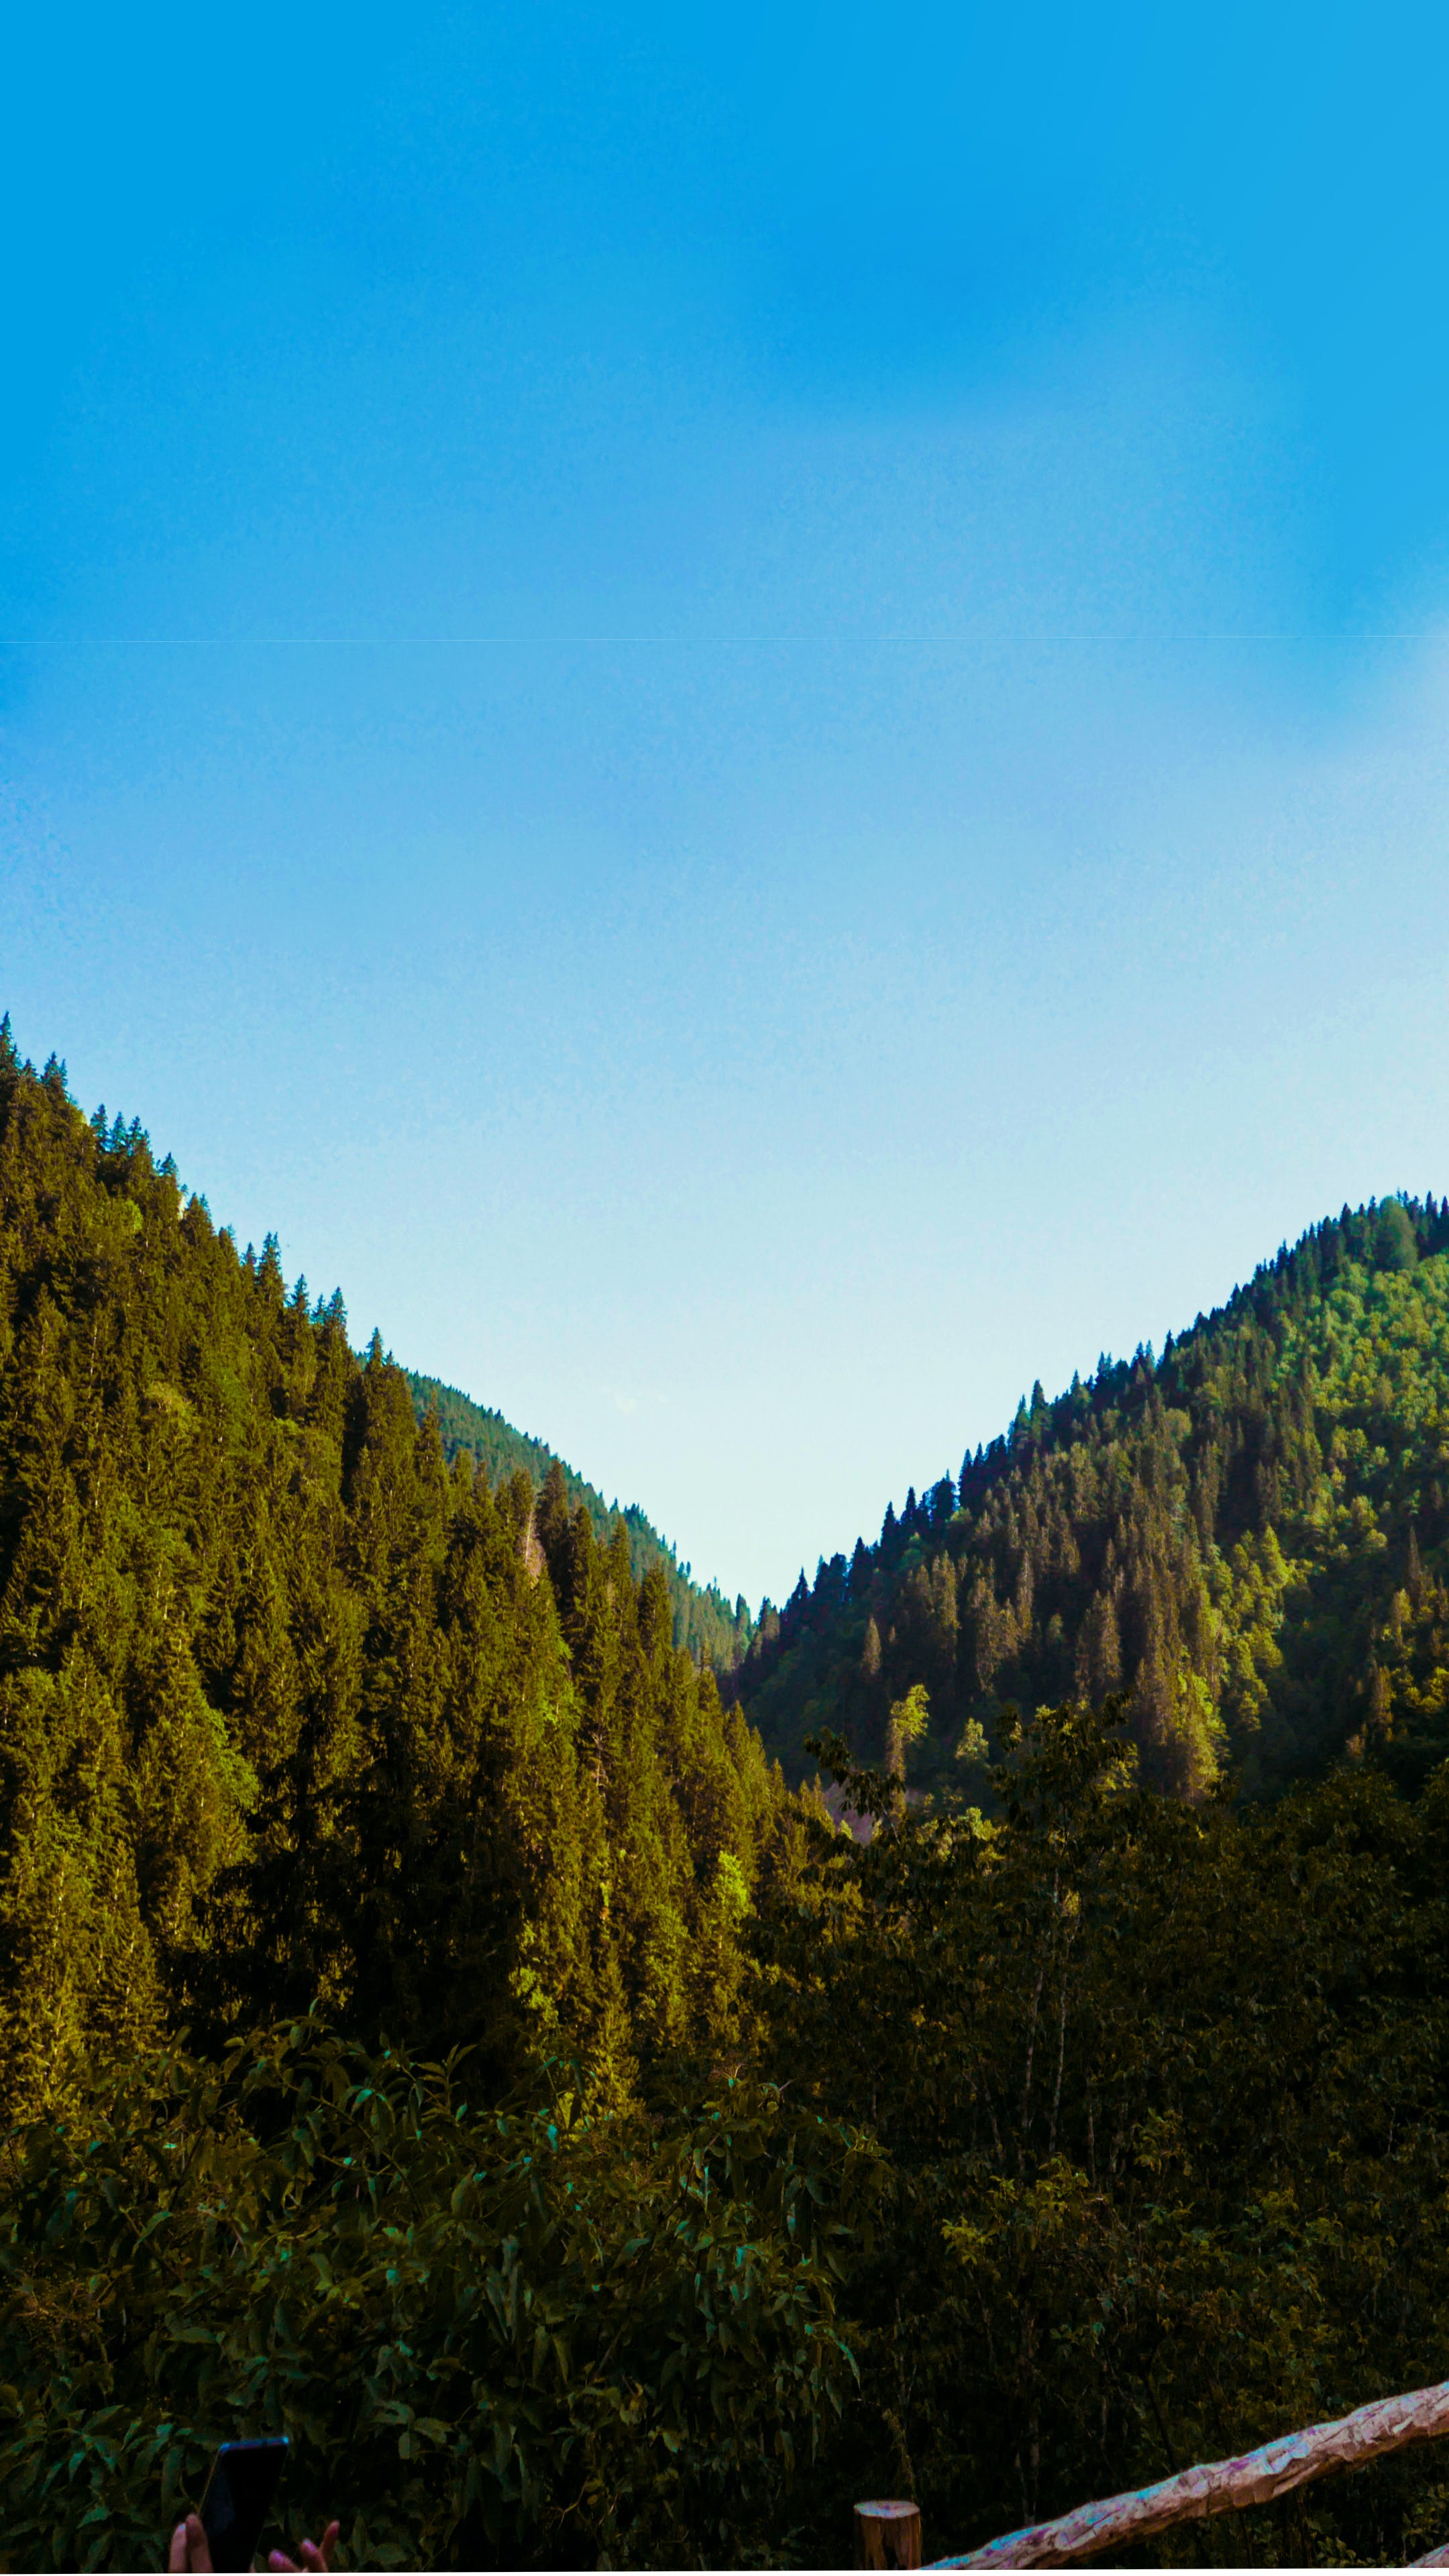 Free stock photo of Black Sea, forest, HD wallpaper, karadeniz